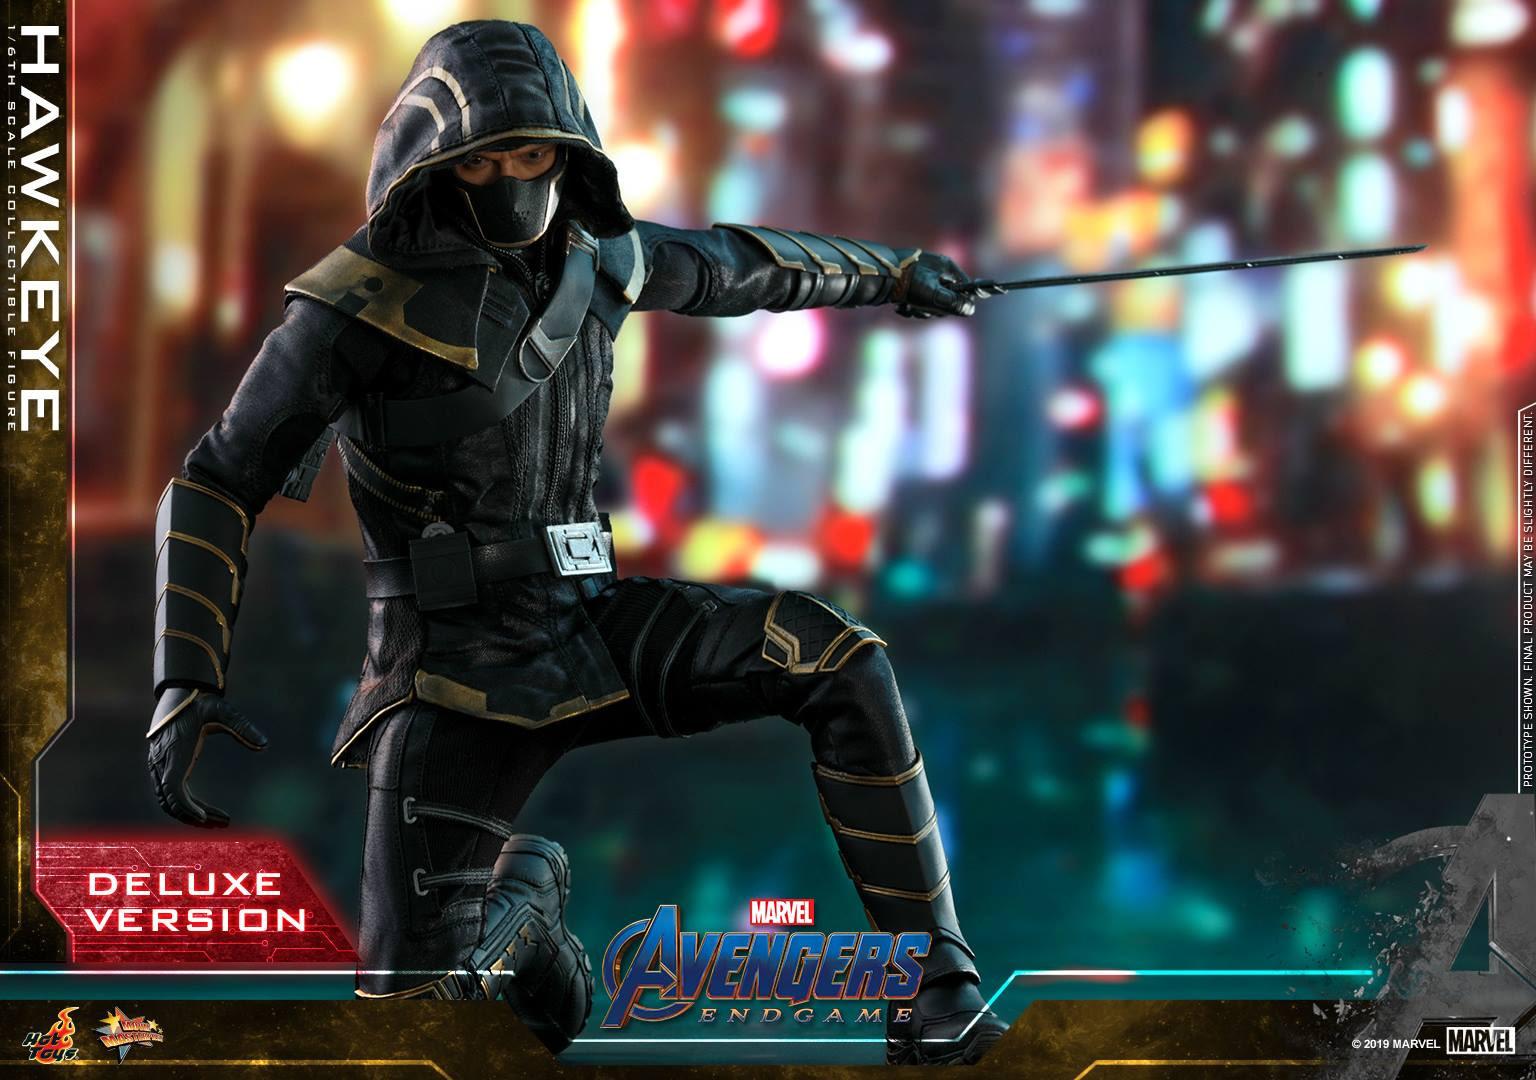 Hot Toys Reveals Hawkeye/Ronin and War Machine Avengers: Endgame Figures